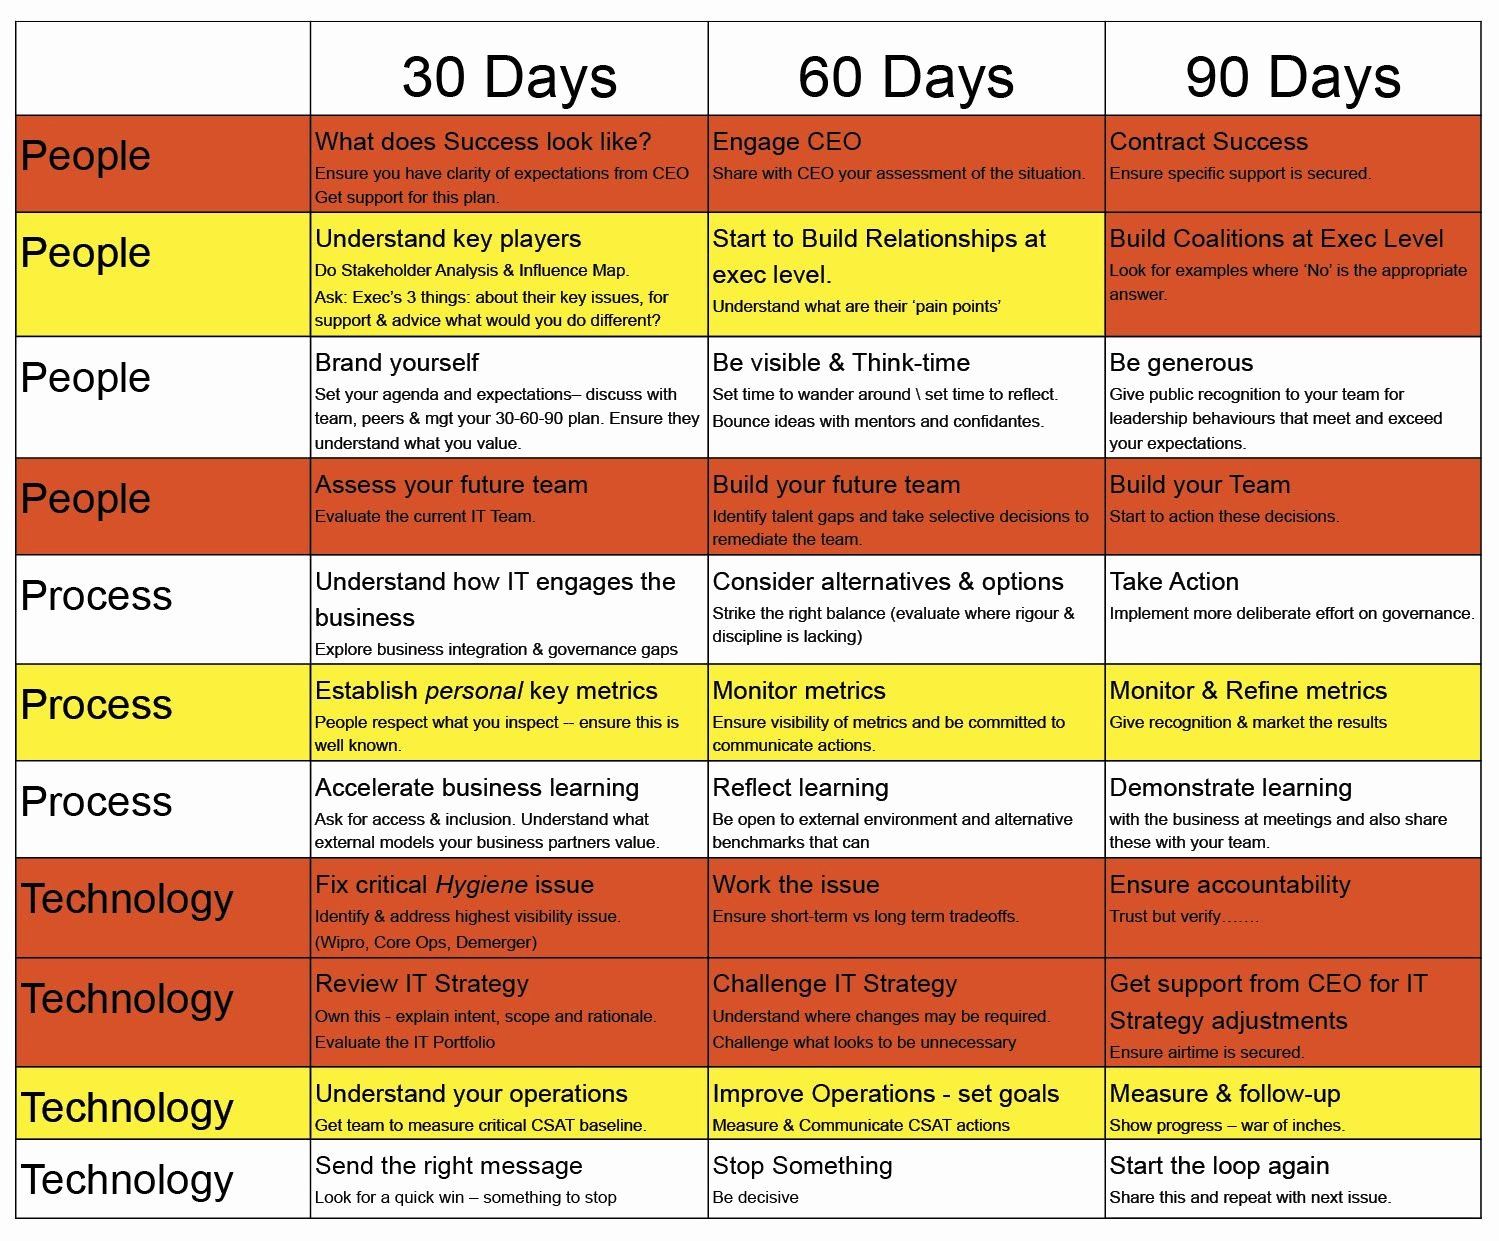 90 Day Marketing Plan Template Inspirational 30 60 90 Days Plan New Job Marketing Google Search